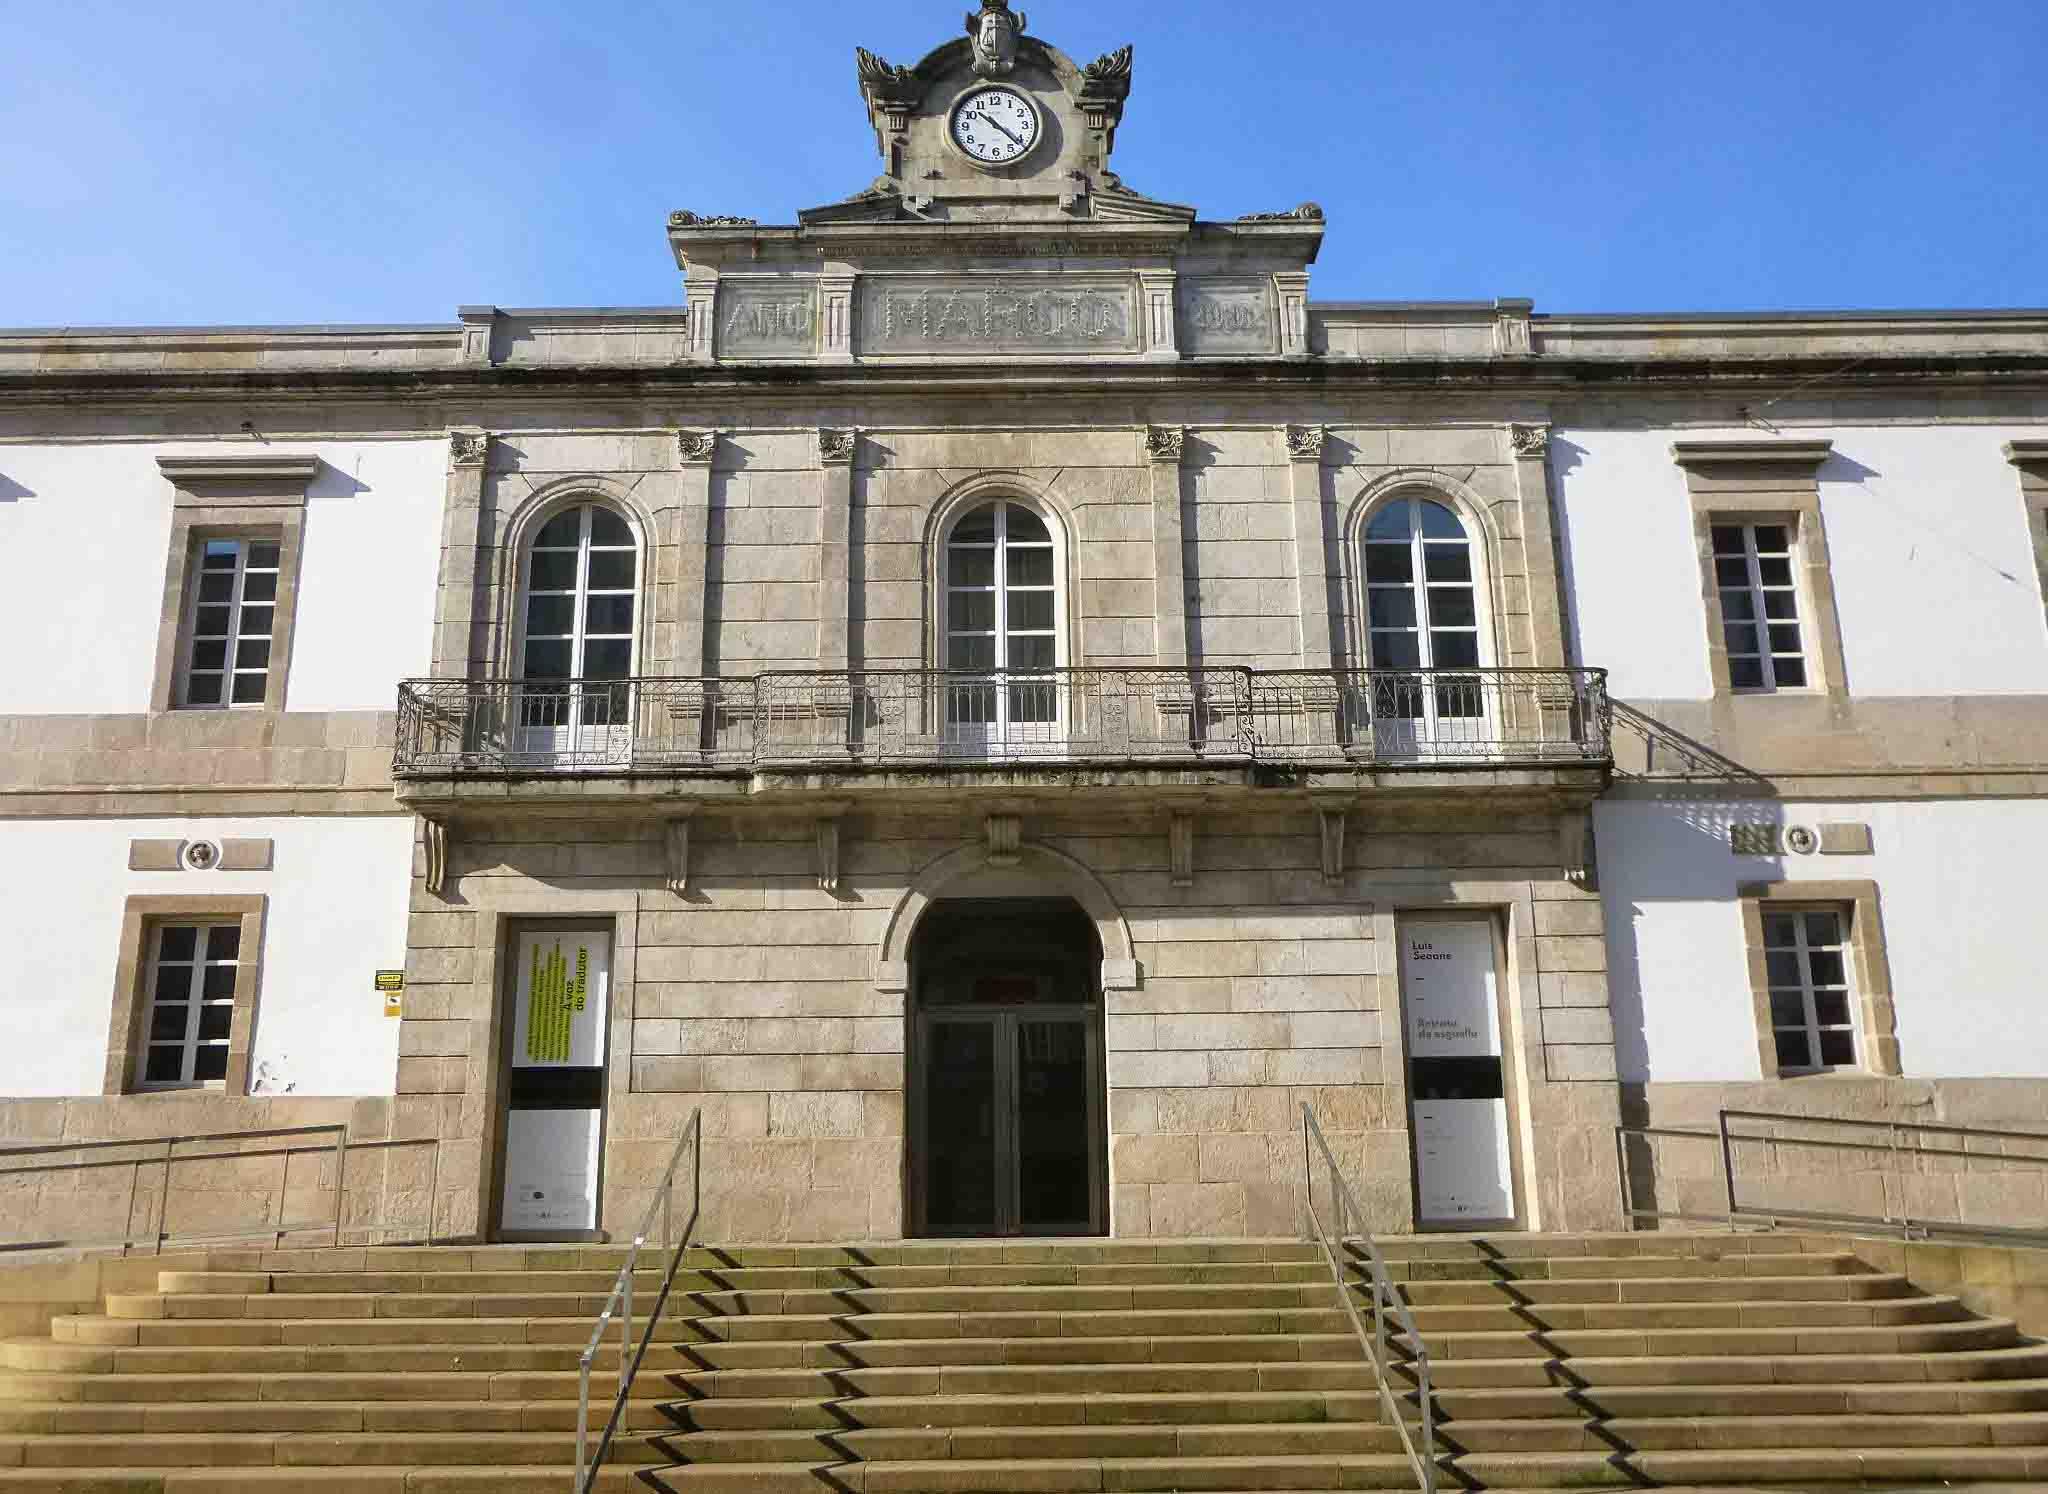 vigo-museo-de-arte-contemporaneo-marco2